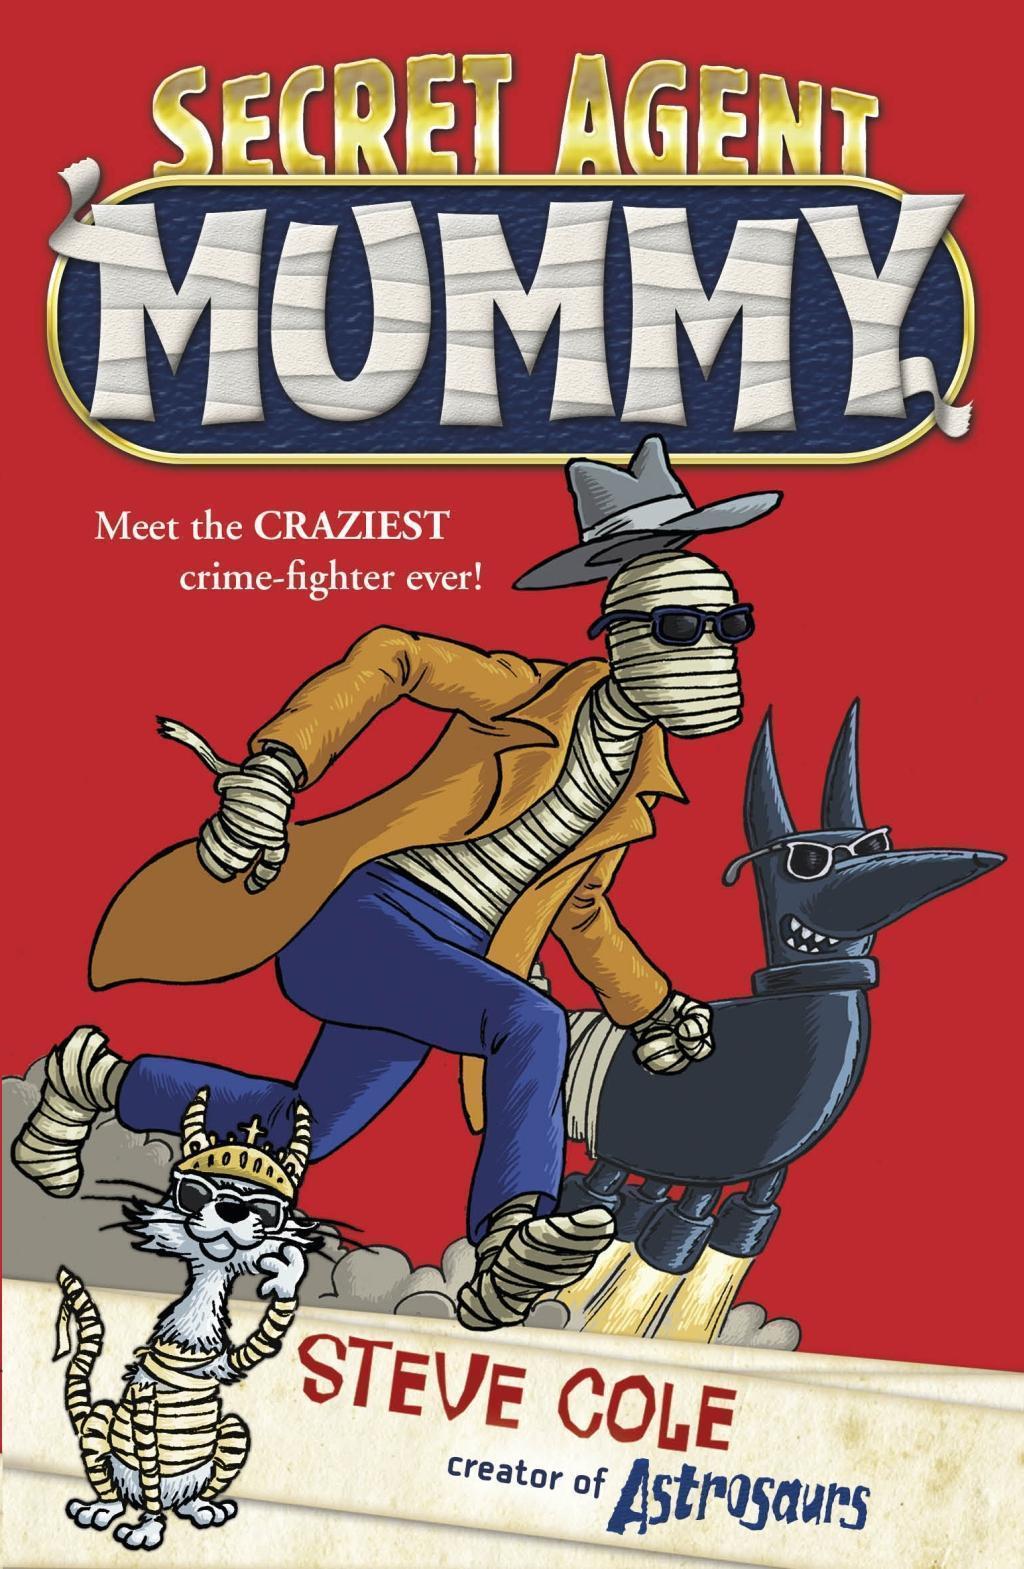 Secret Agent Mummy